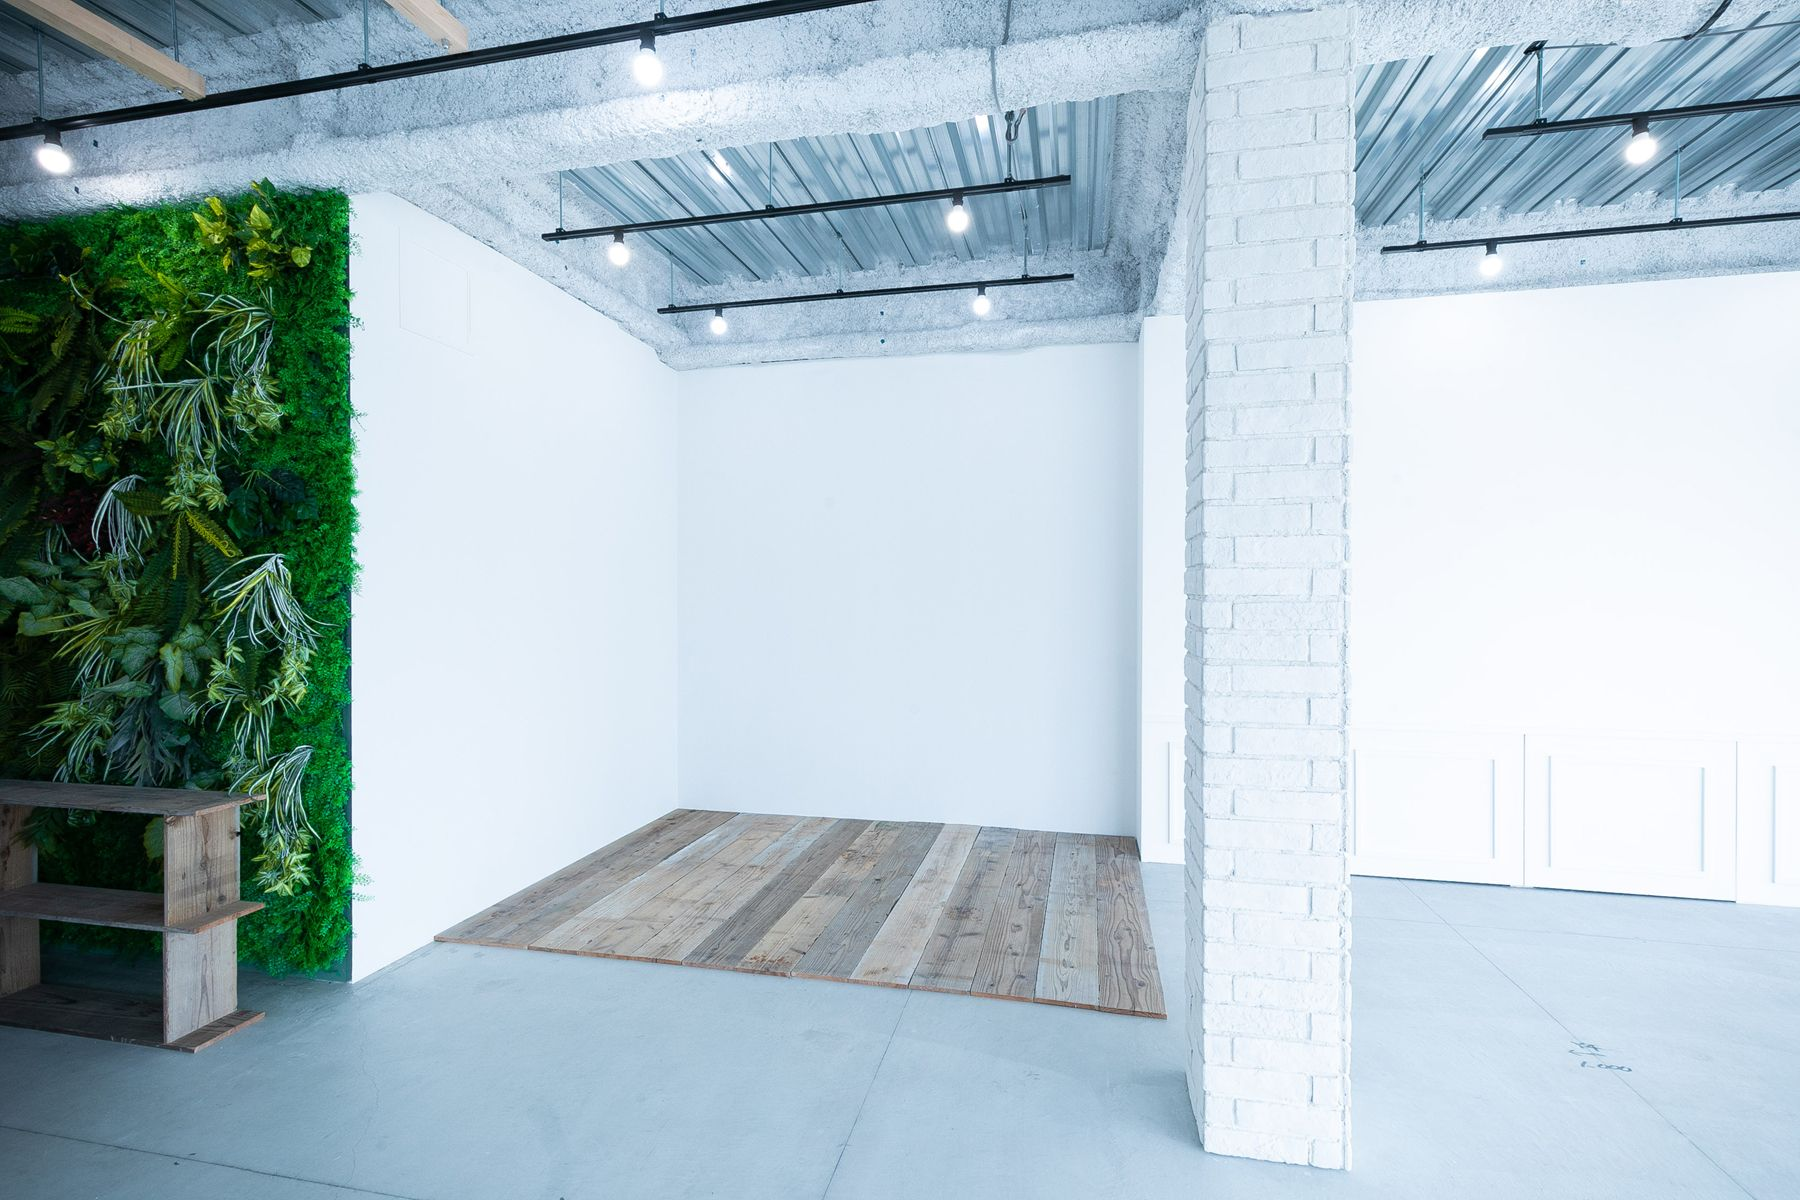 STUDIO FLYINGCAT (スタジオ フライングキャット)白壁エリアには自由に敷ける床板